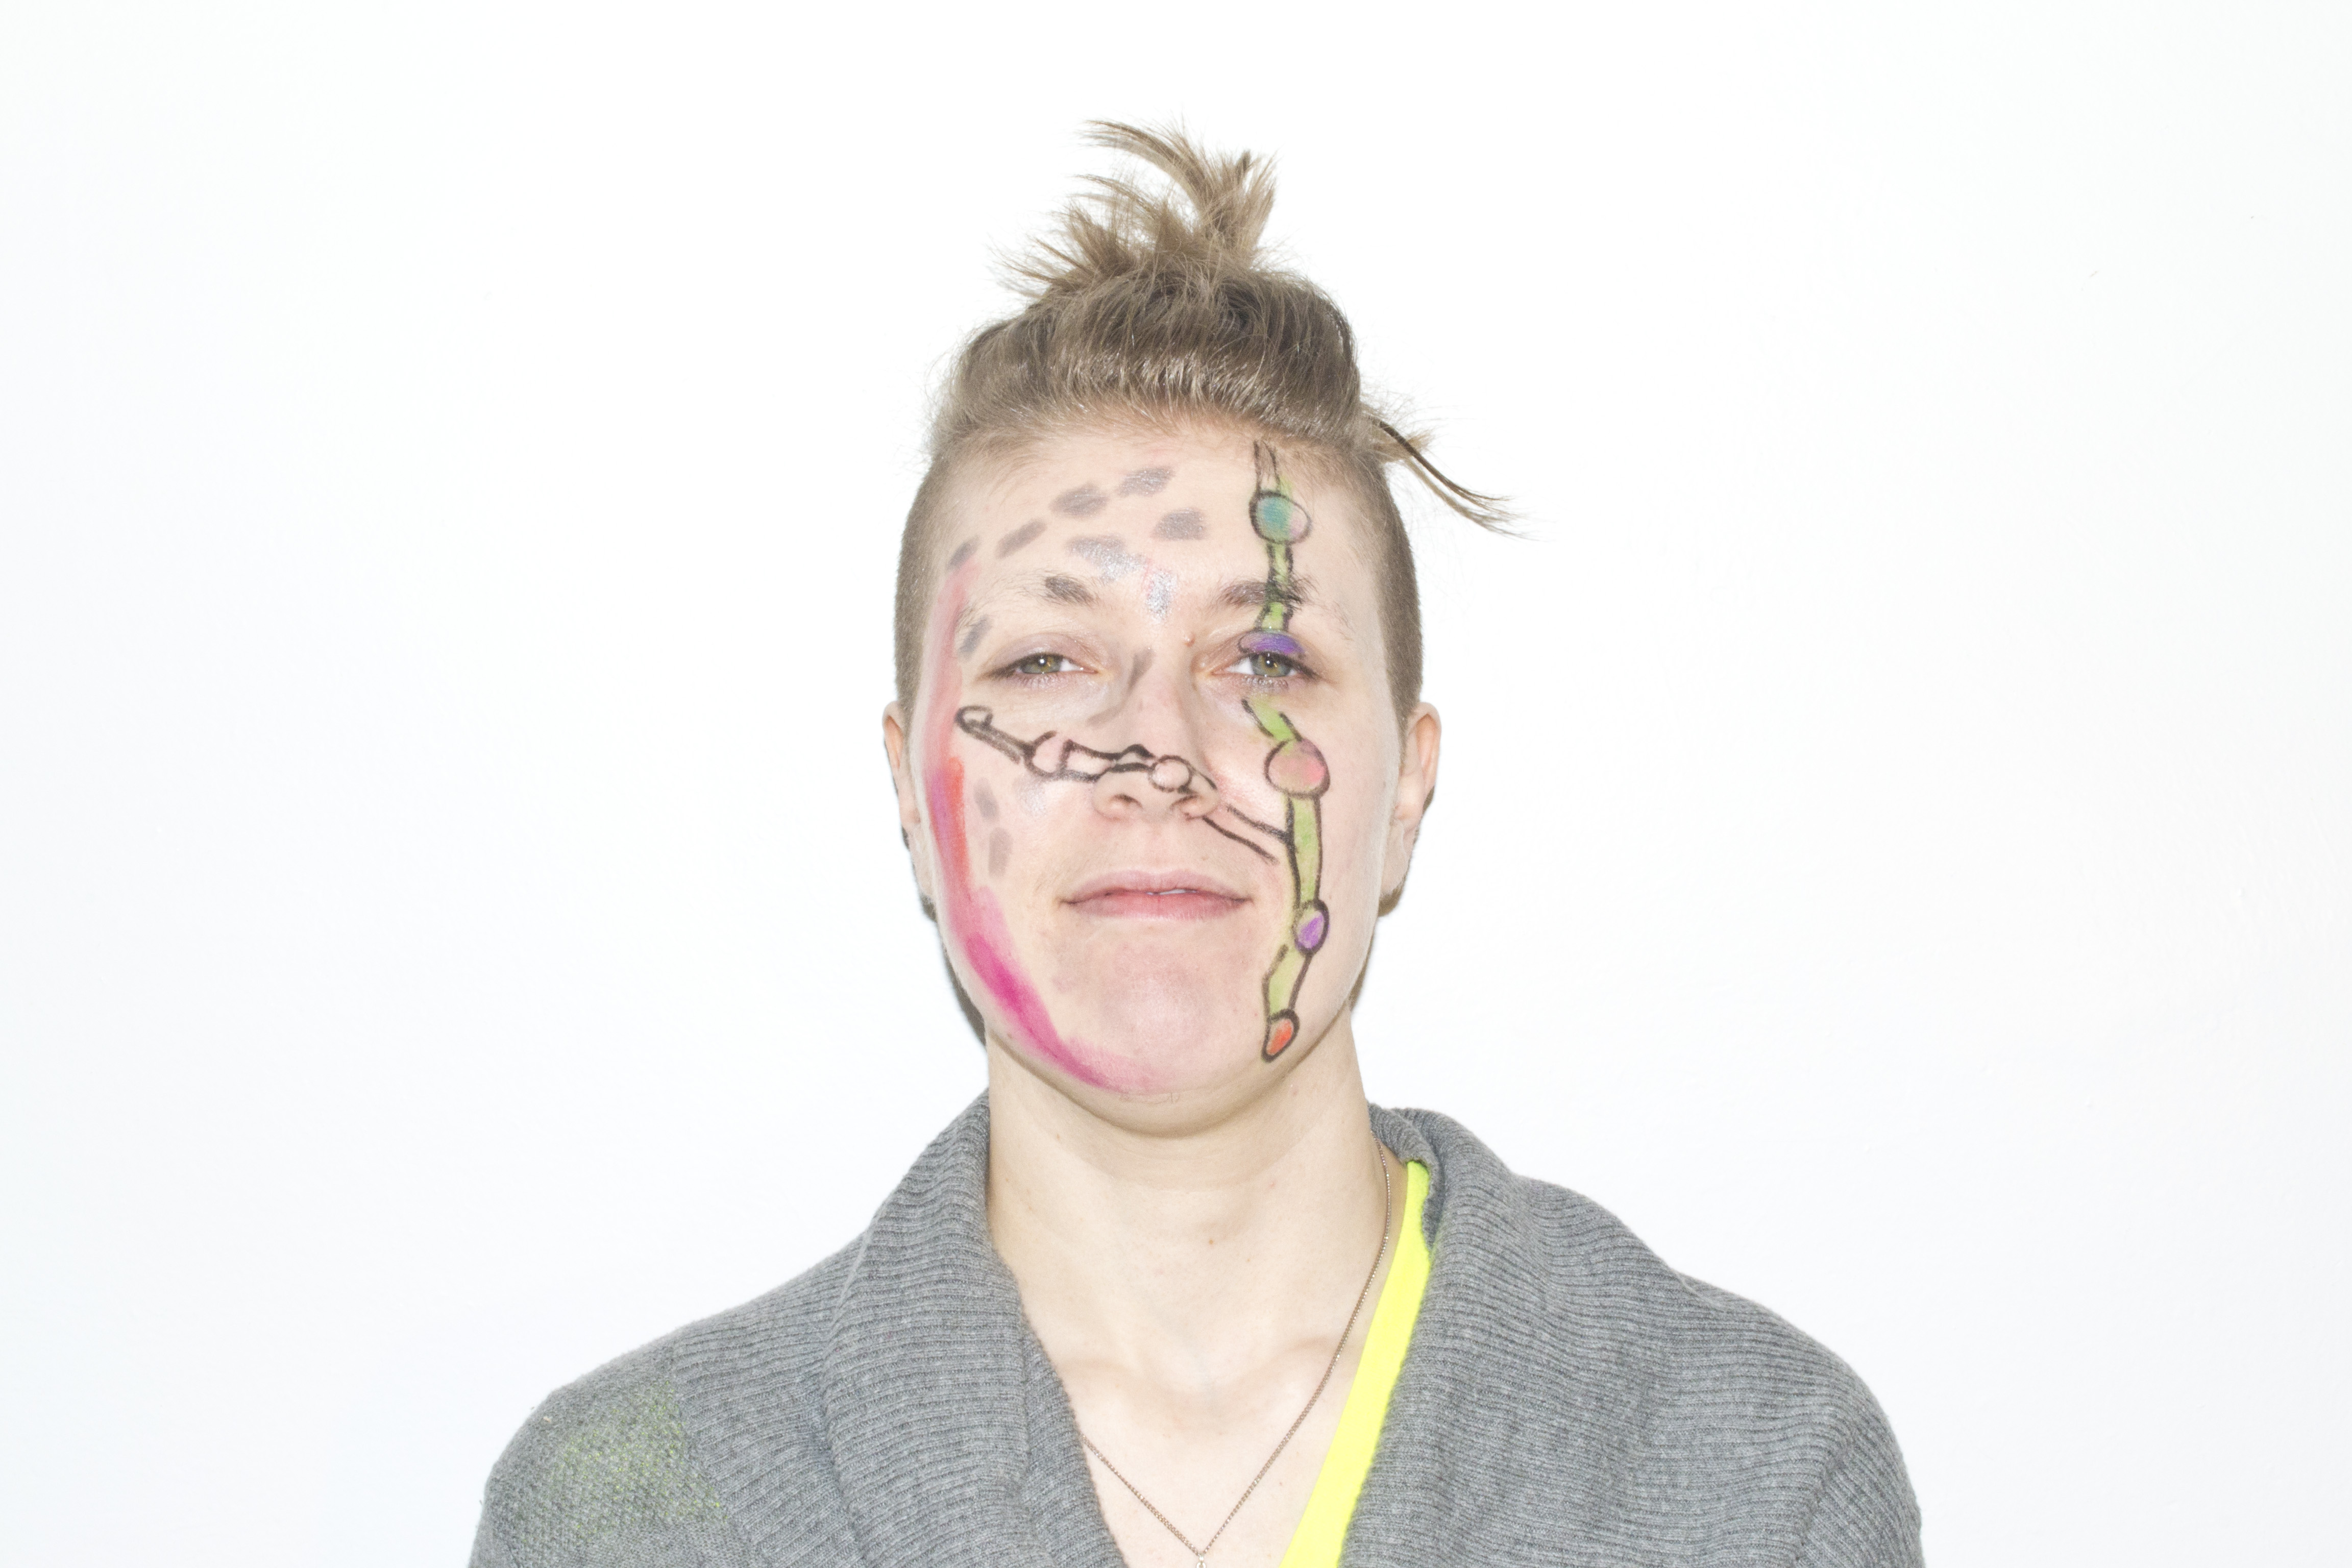 makeupedit1.JPG